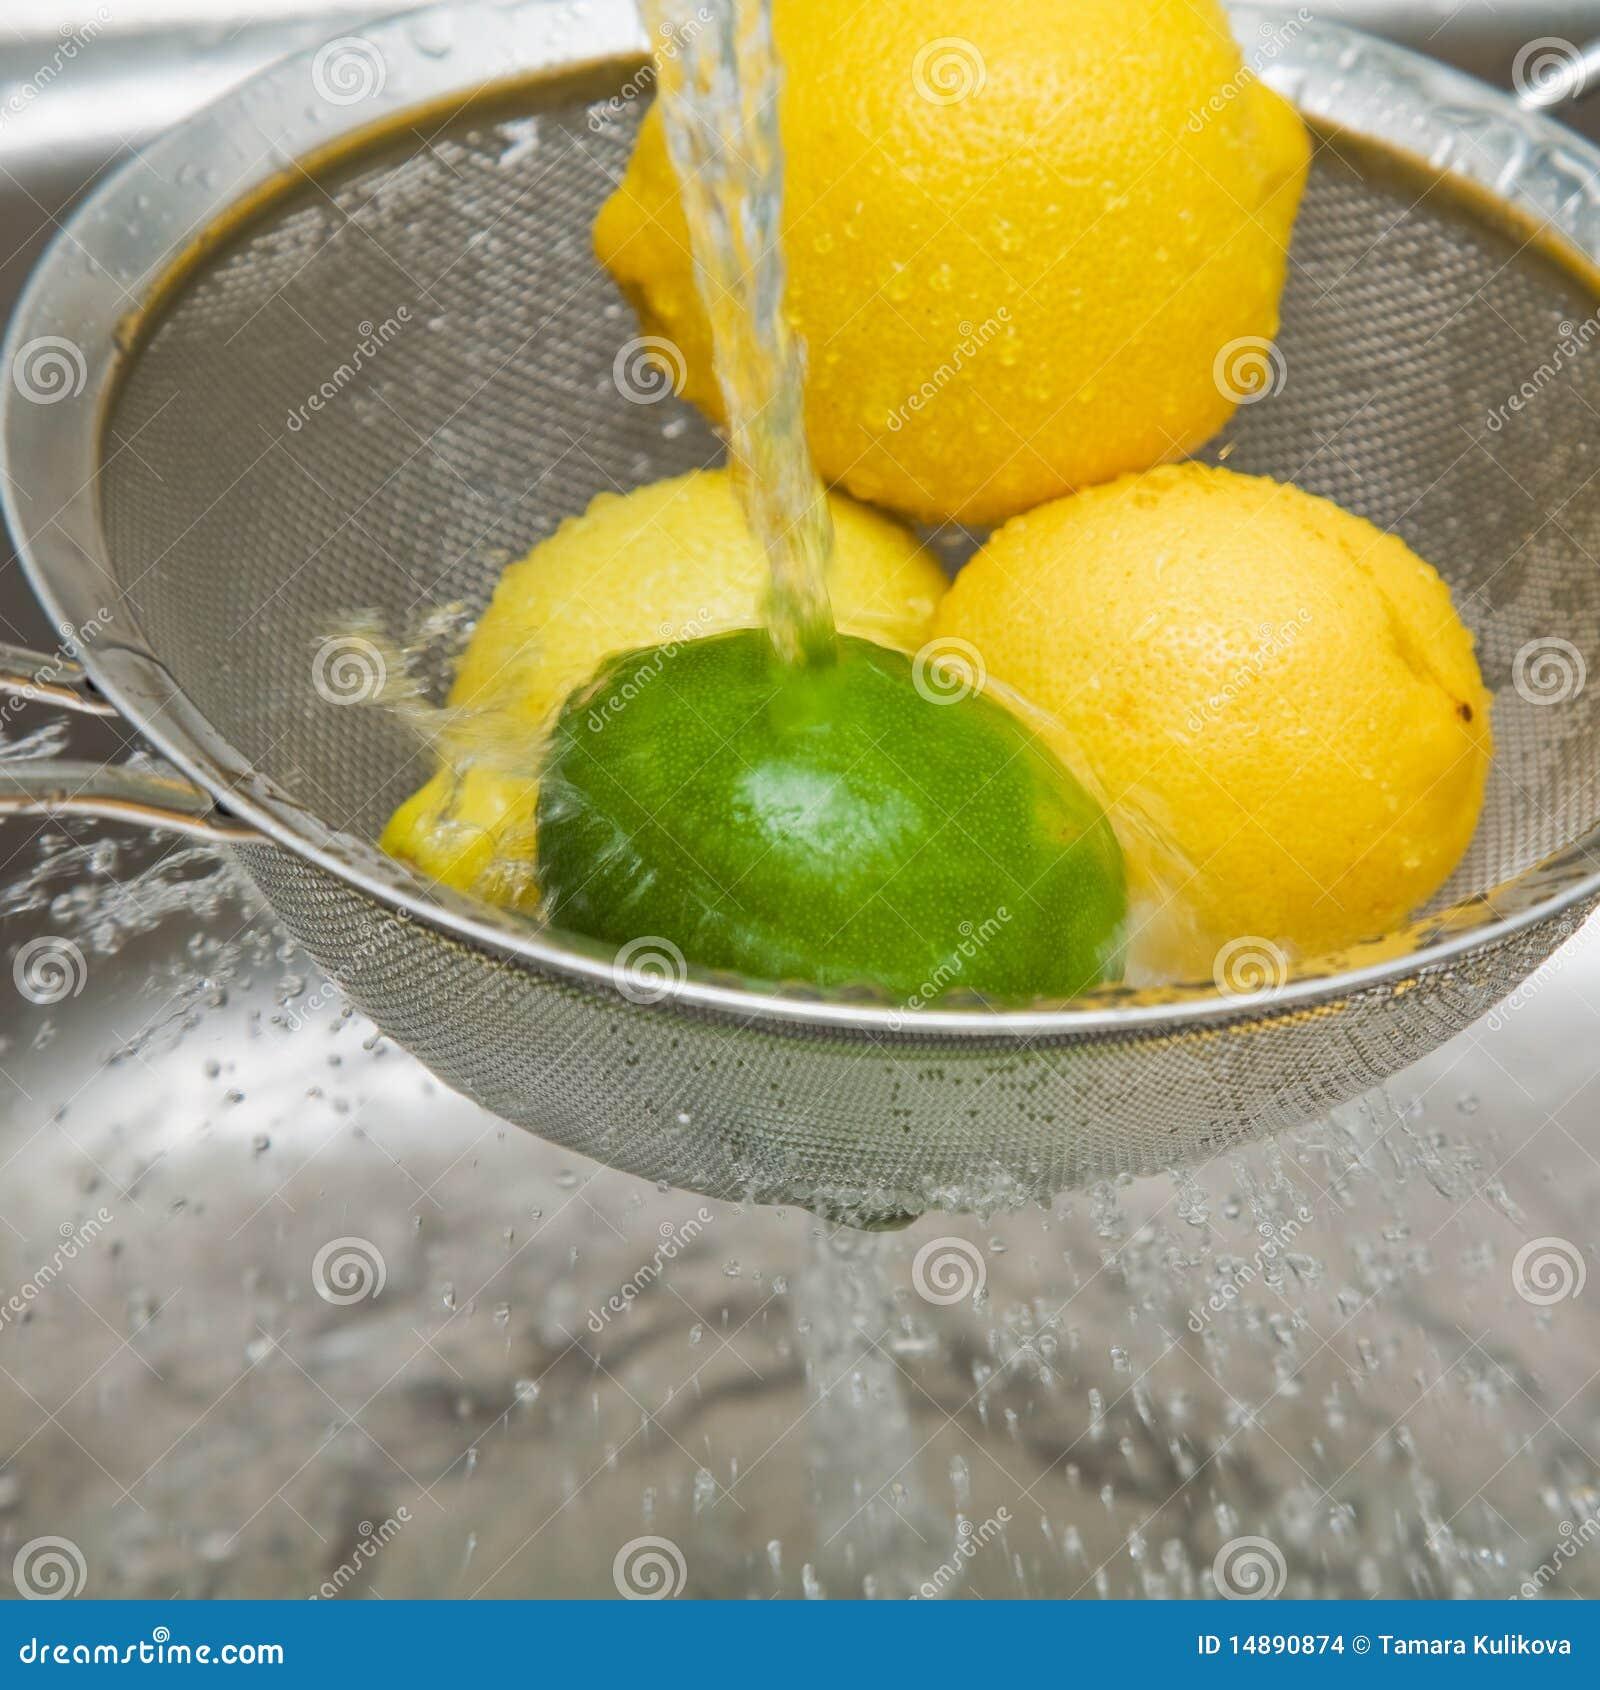 Washing Lemons And Lime Stock Images Image 14890874